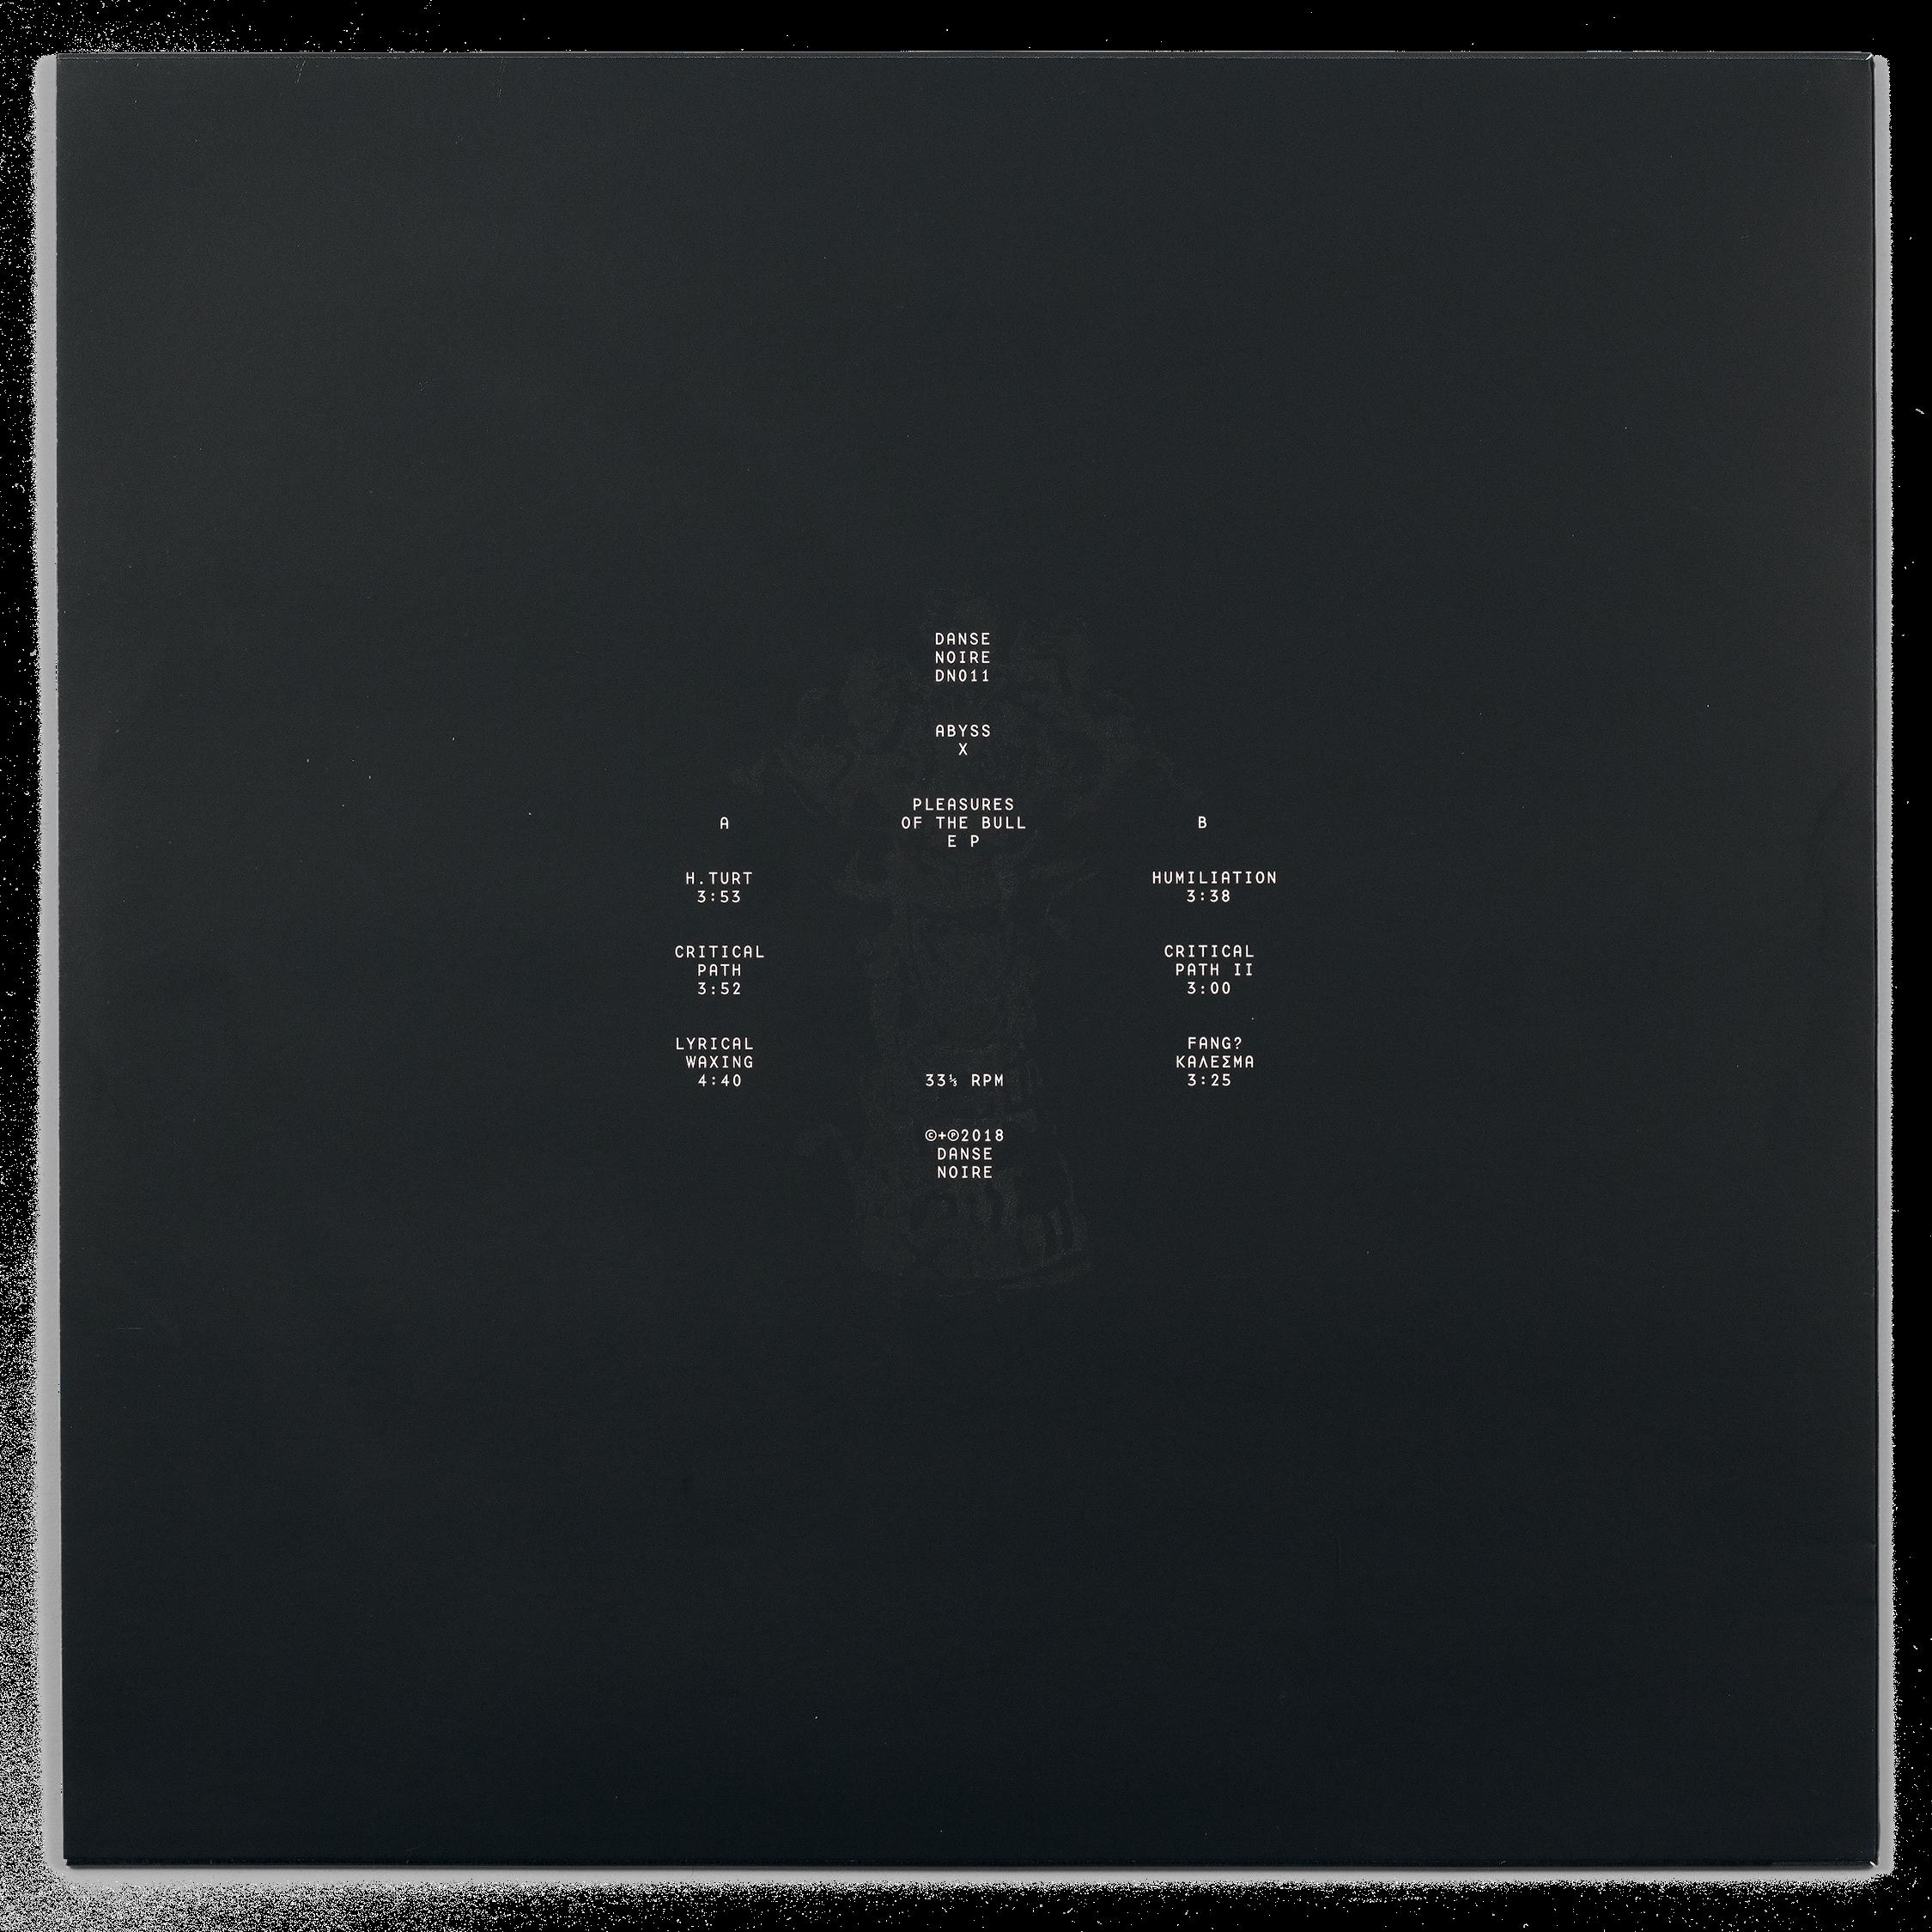 Danse Noire 011, Abyss X, Pleasures of the Bull vinyl, dos